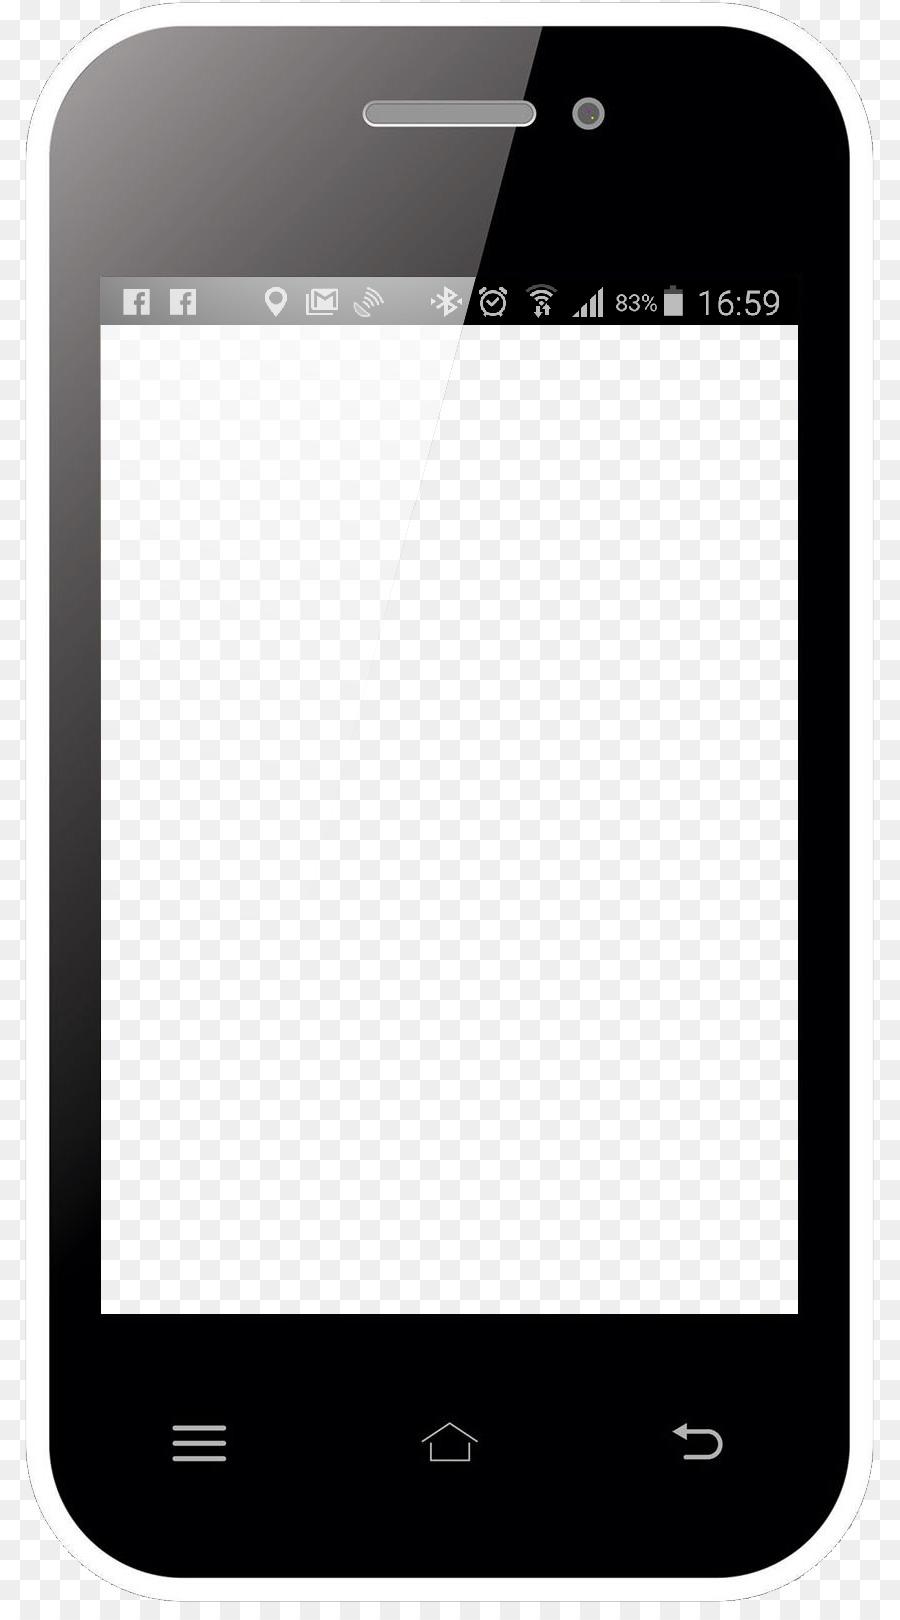 Ipad Cartoon png download - 862*1605 - Free Transparent